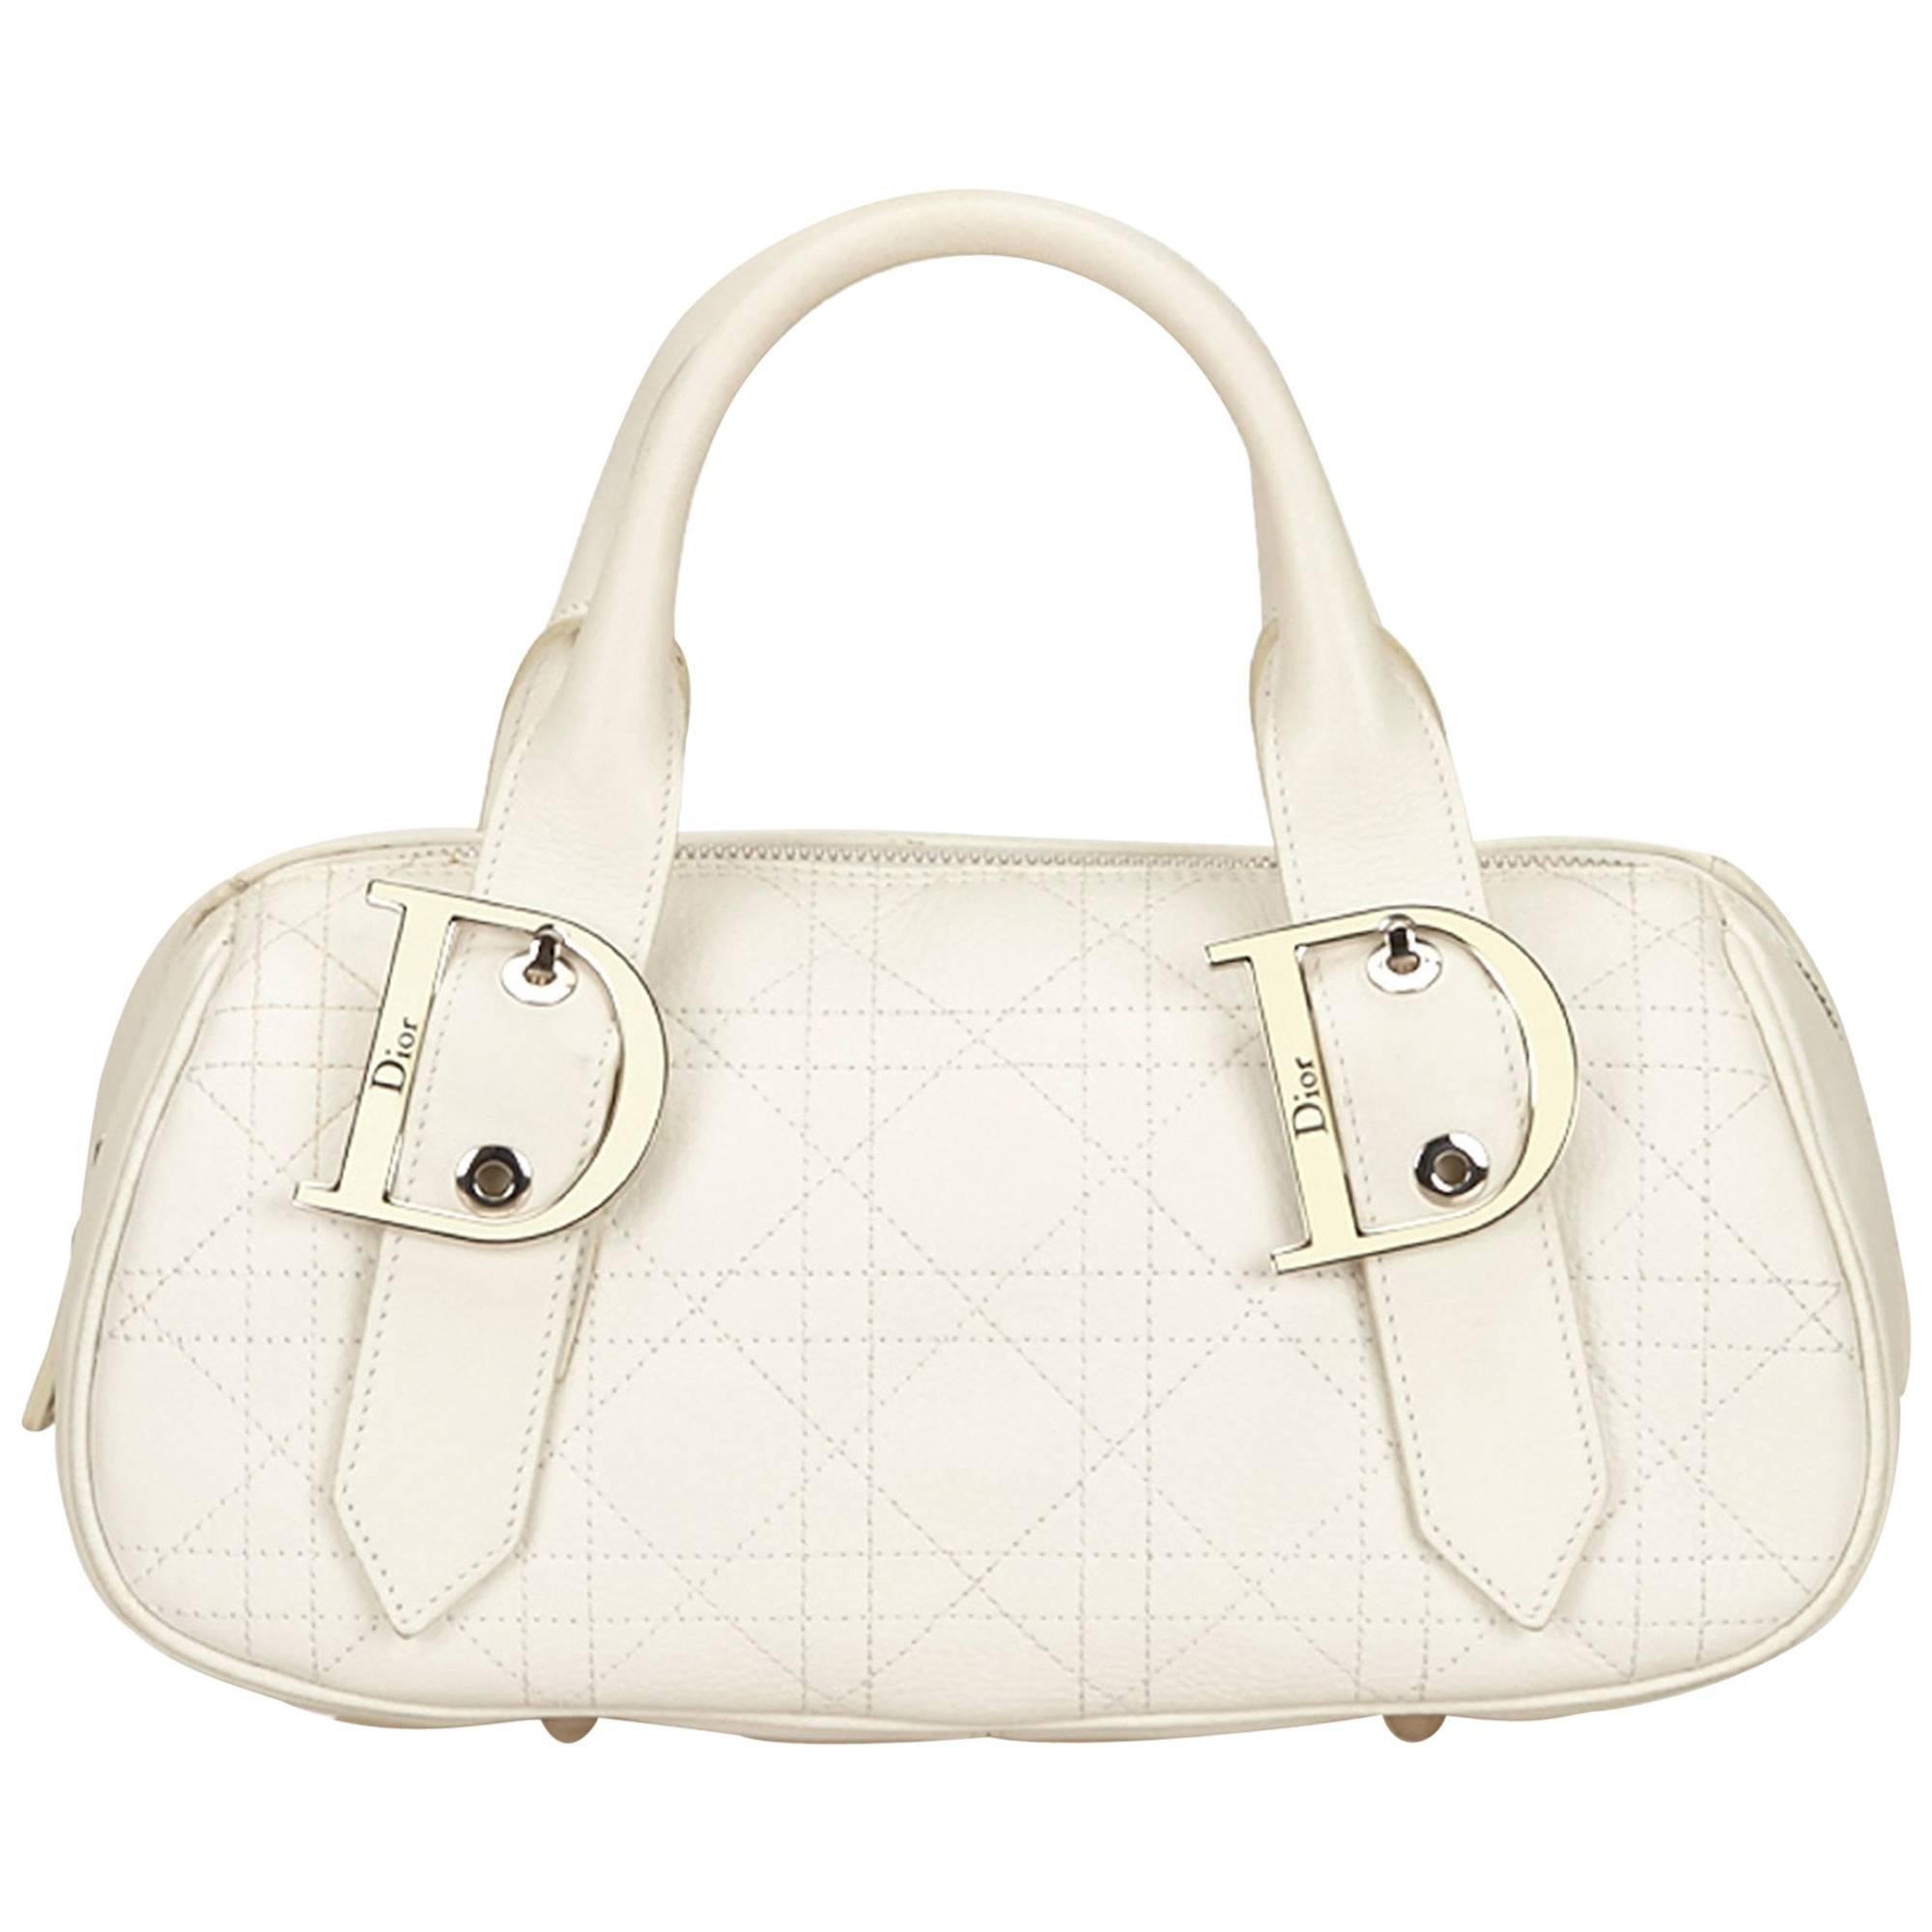 Dior White Gambler Cubes Bag JRoVUA